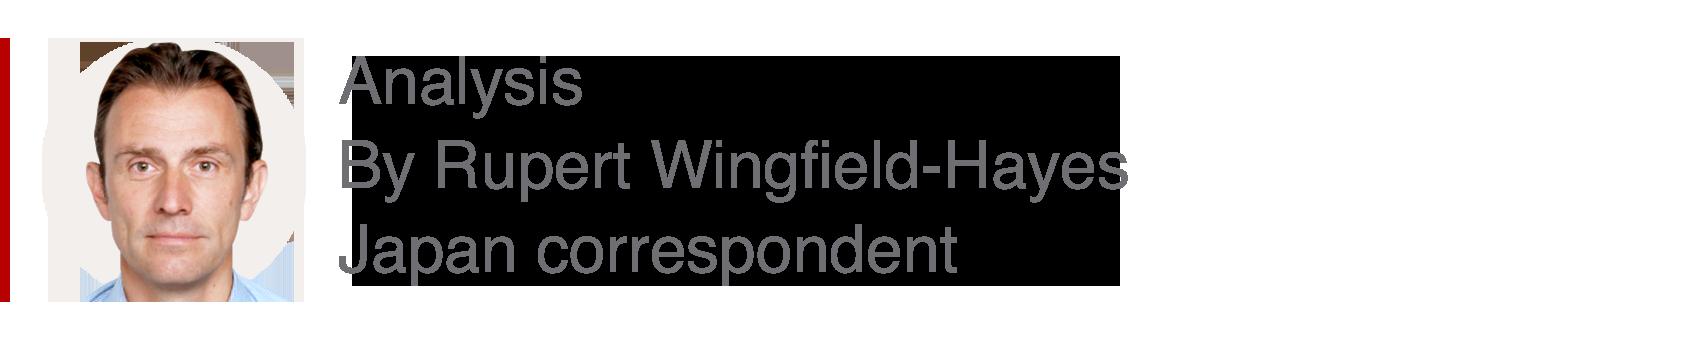 Analysis box by Rupert Wingfield-Hayes, Japan correspondent